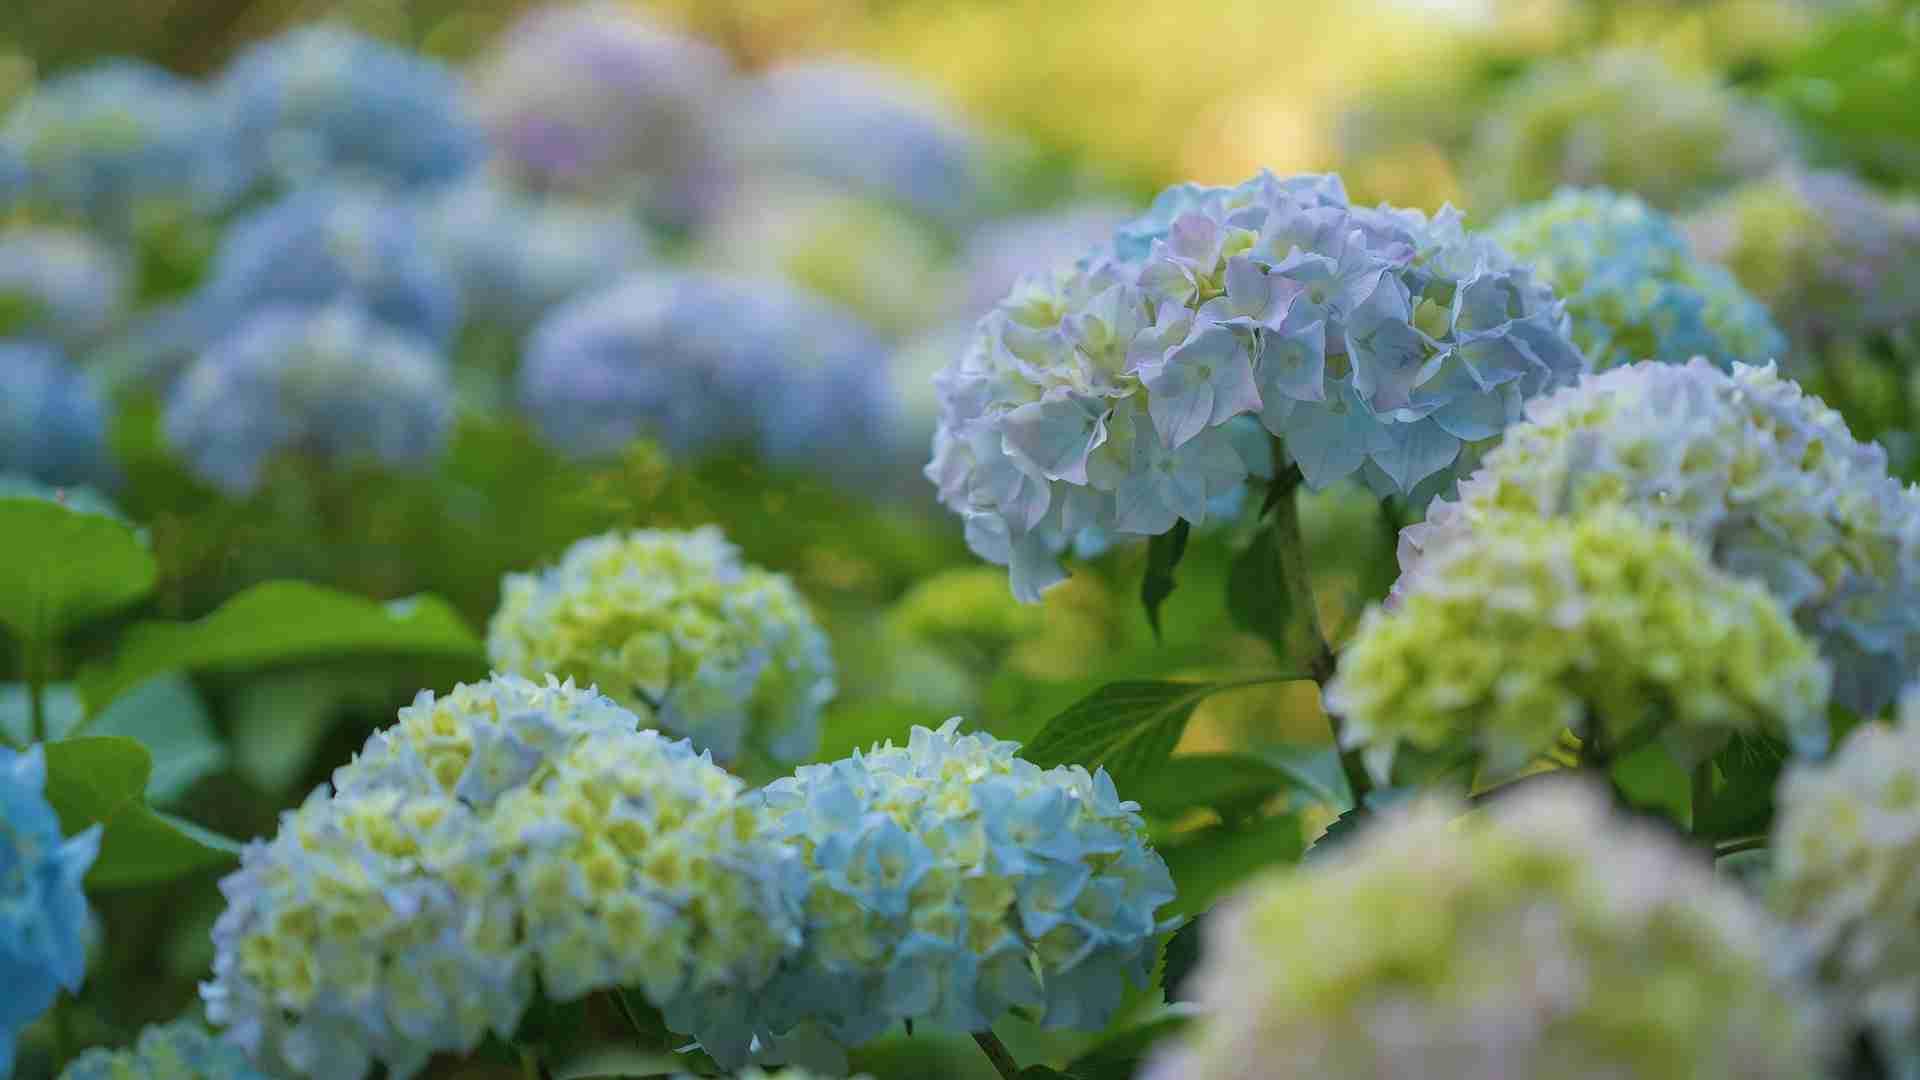 Hortensien Blütezeit